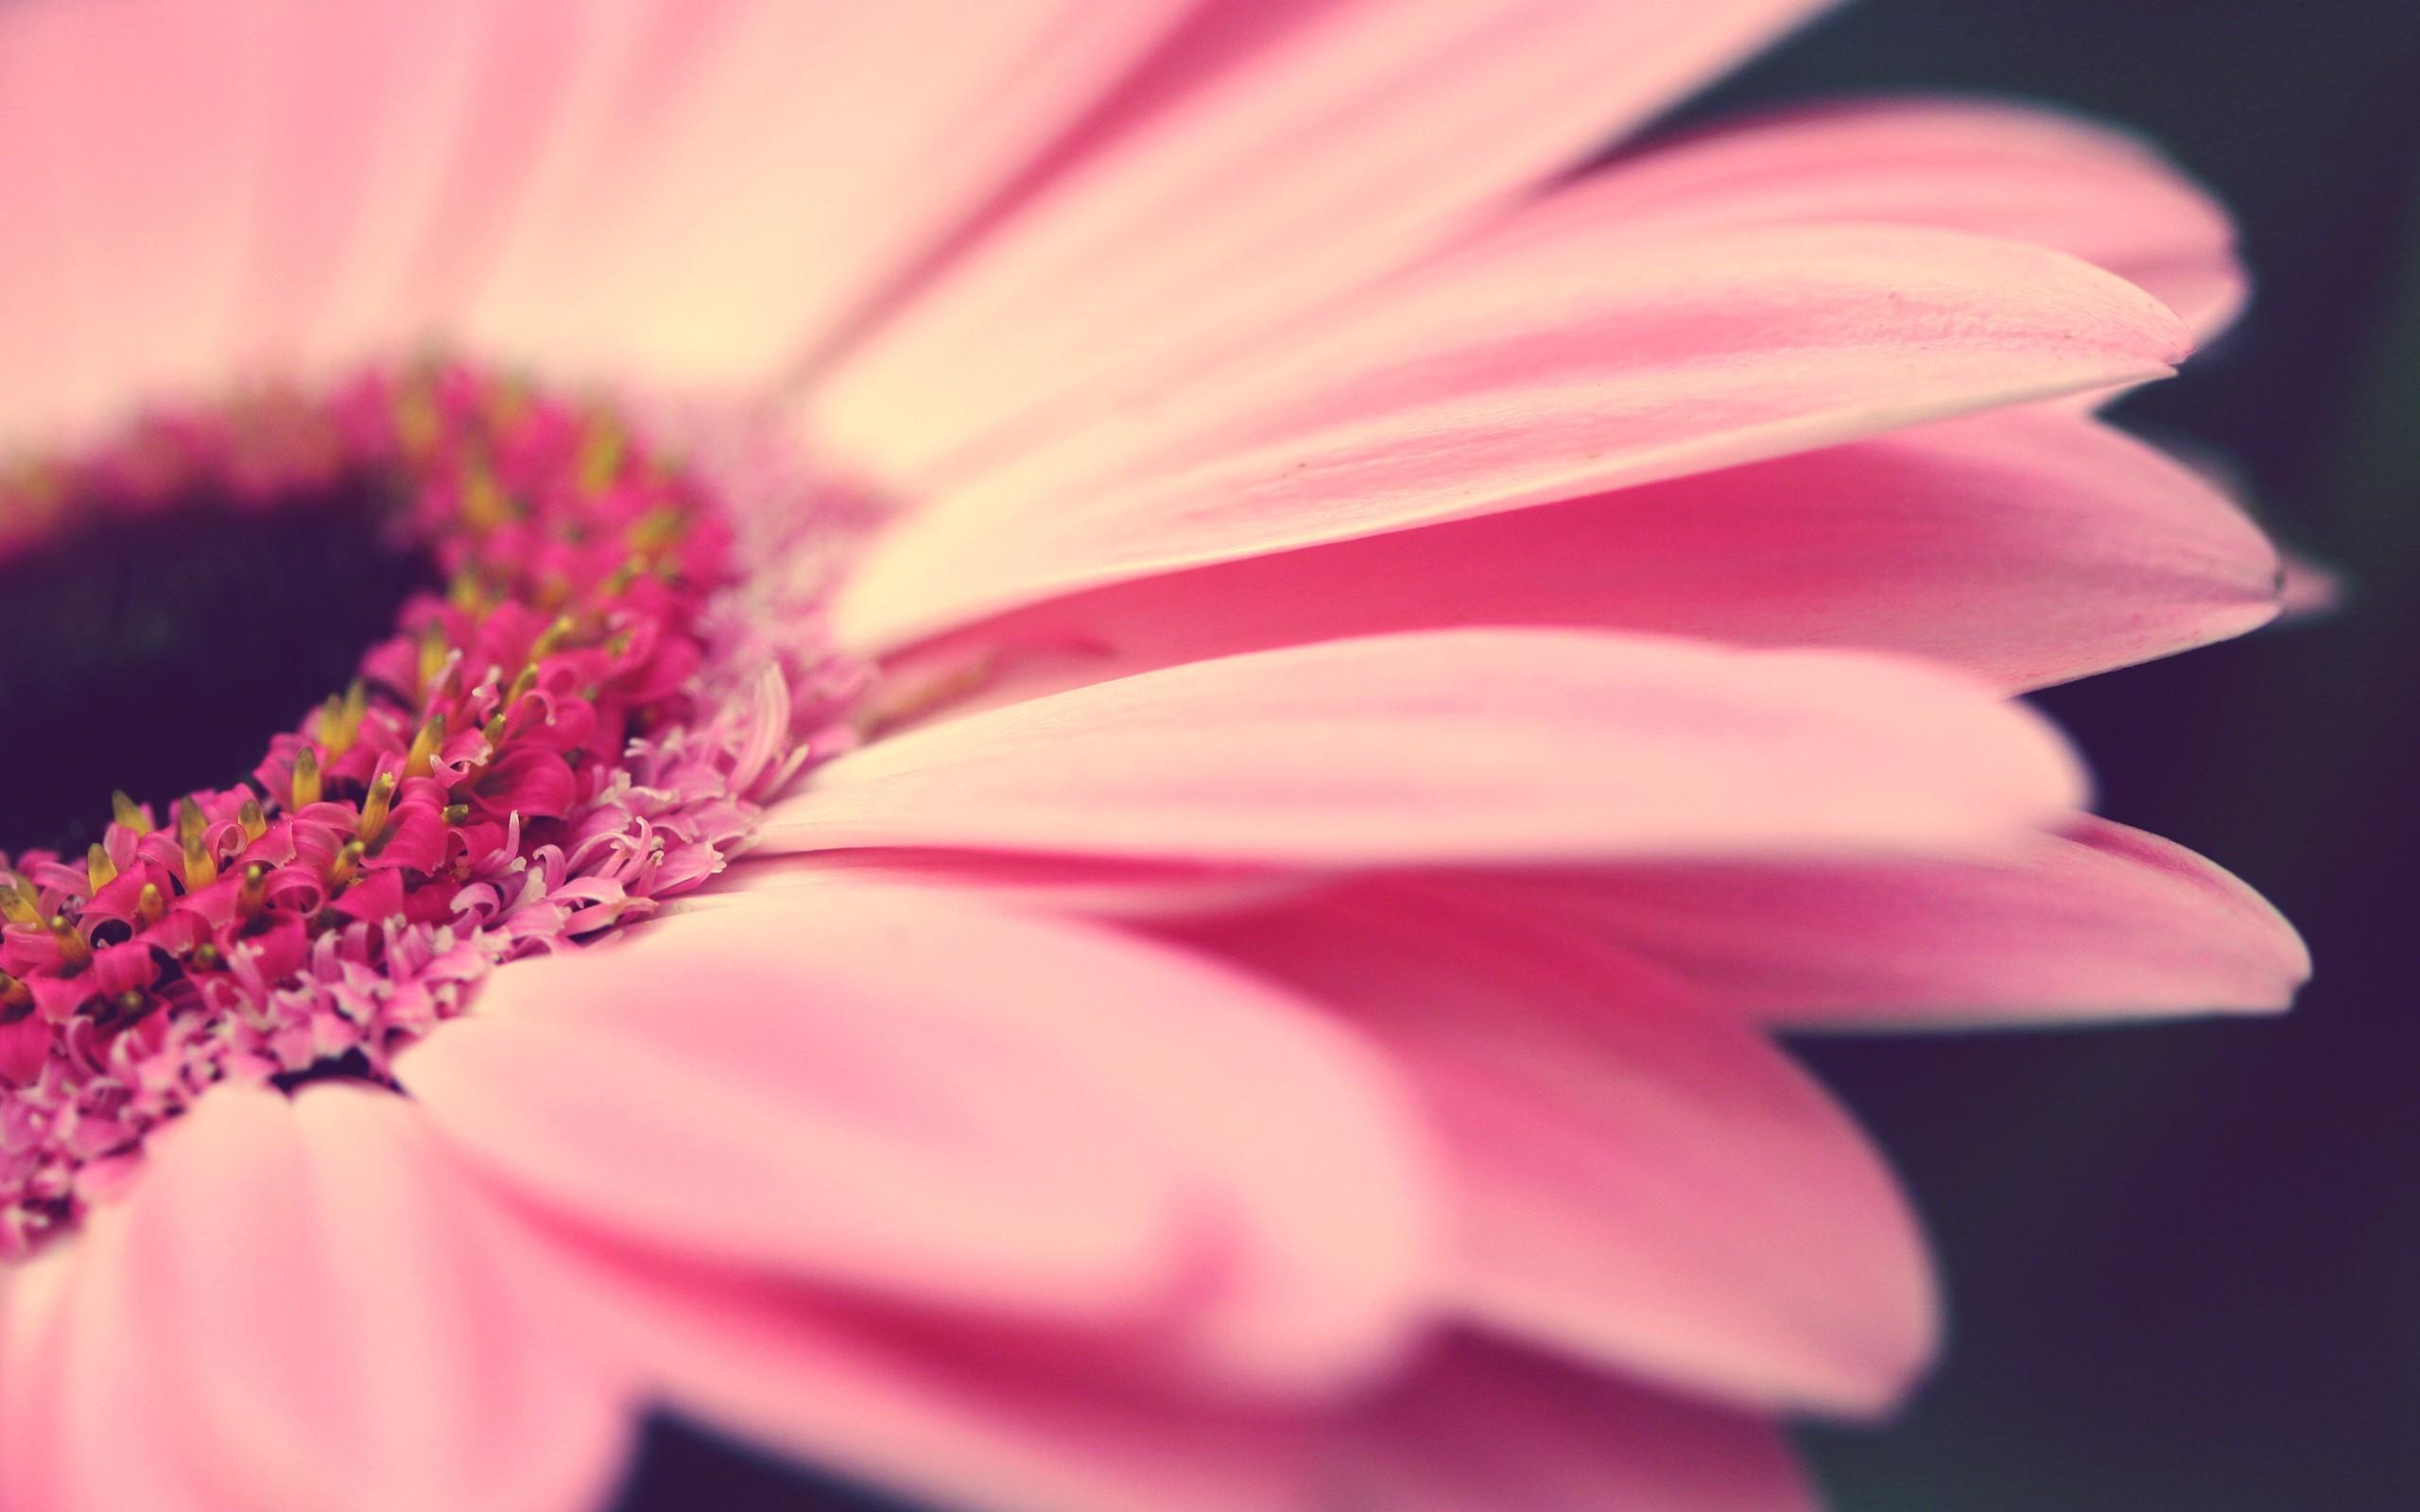 картинки на телефон растения тюль превосходно